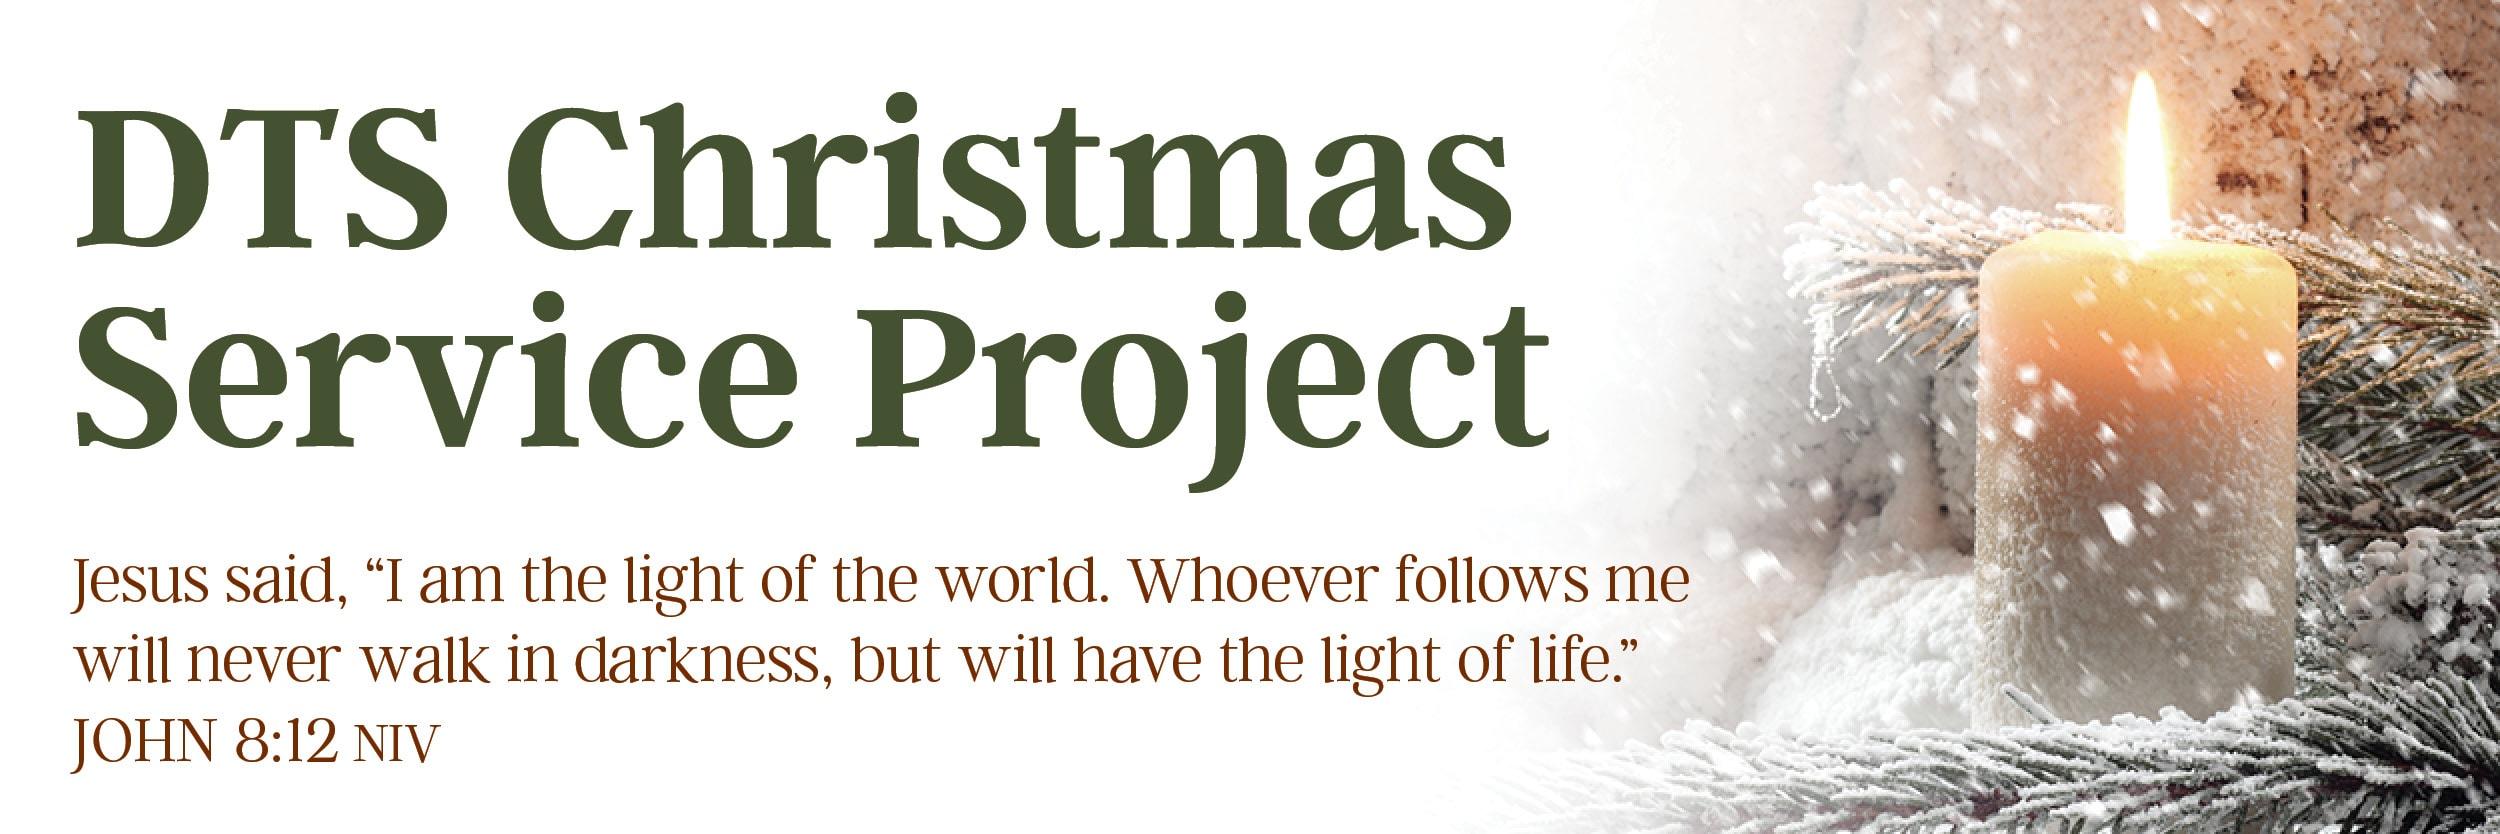 2016 ChristmasService 1